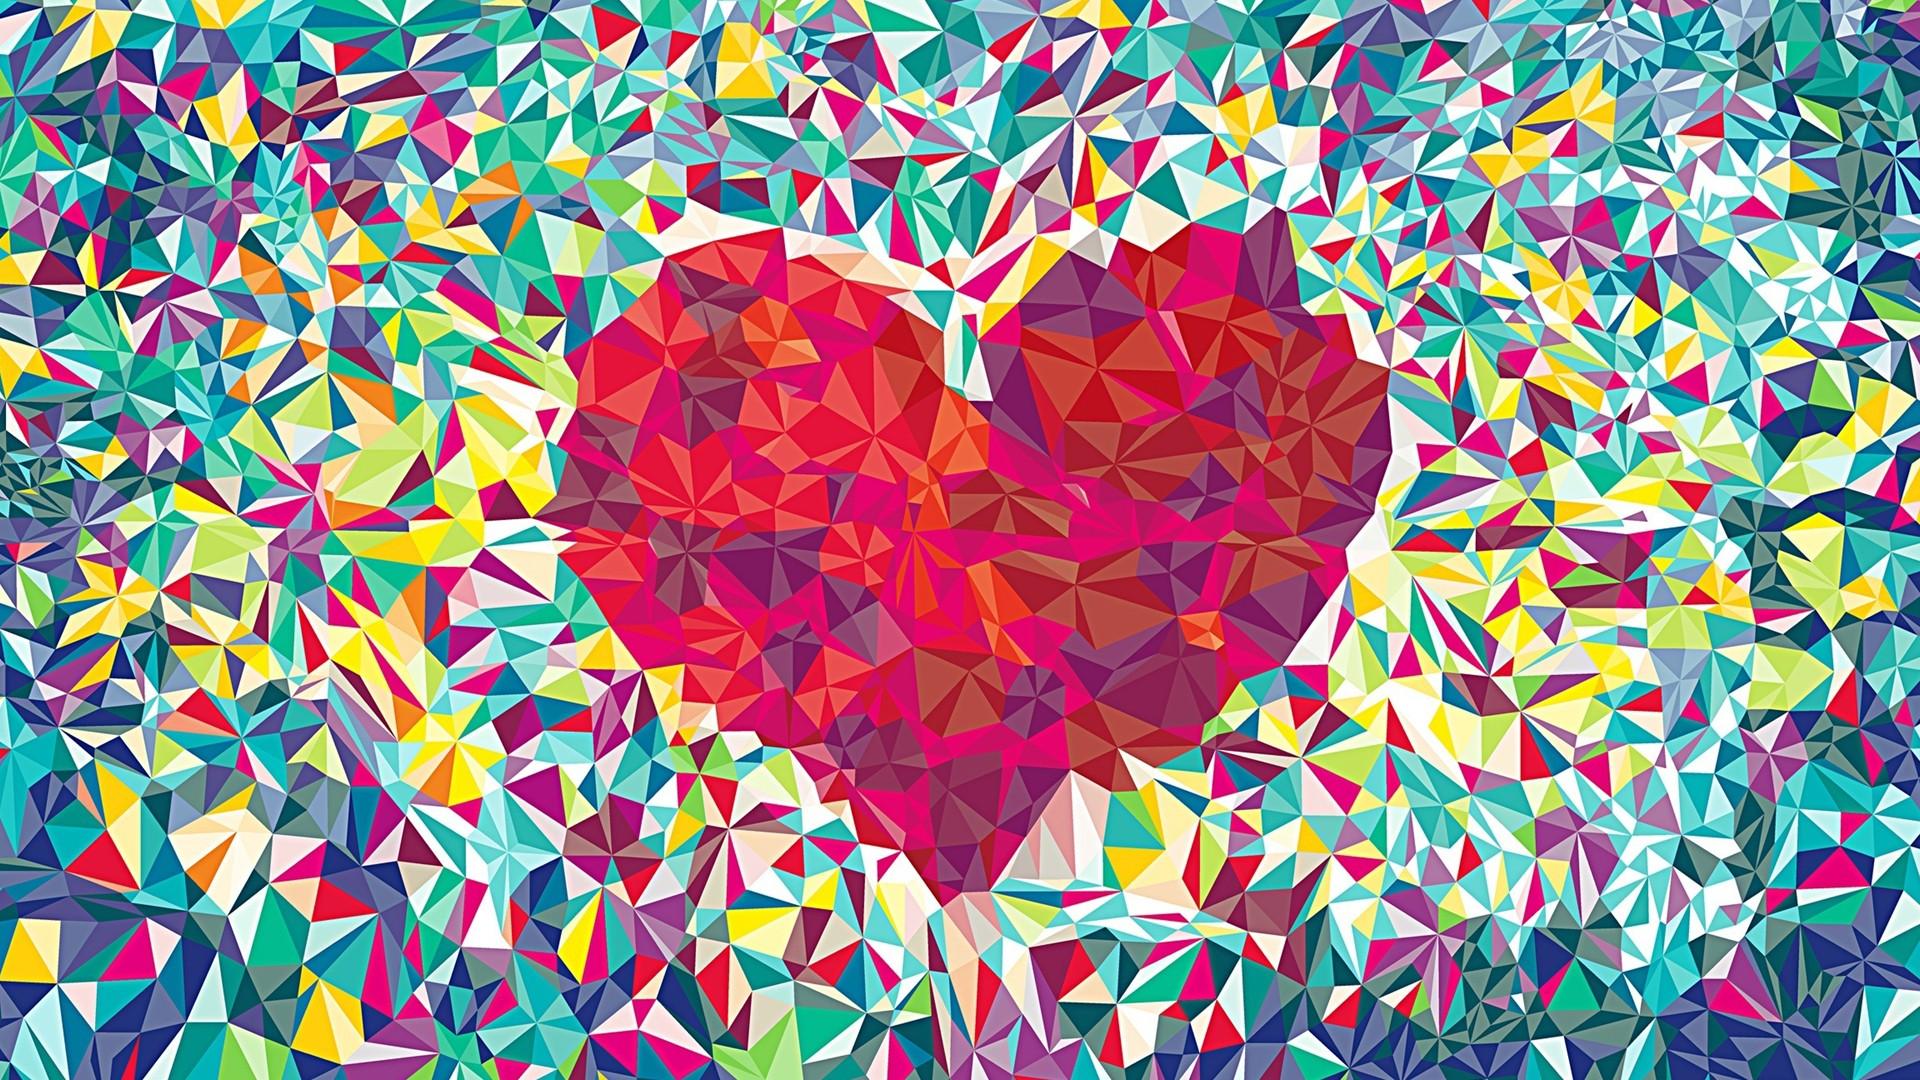 Hd wallpaper cool - Cool Wallpapers Love Heart Hd Wallpaper Of Love Hdwallpaper2013 Com